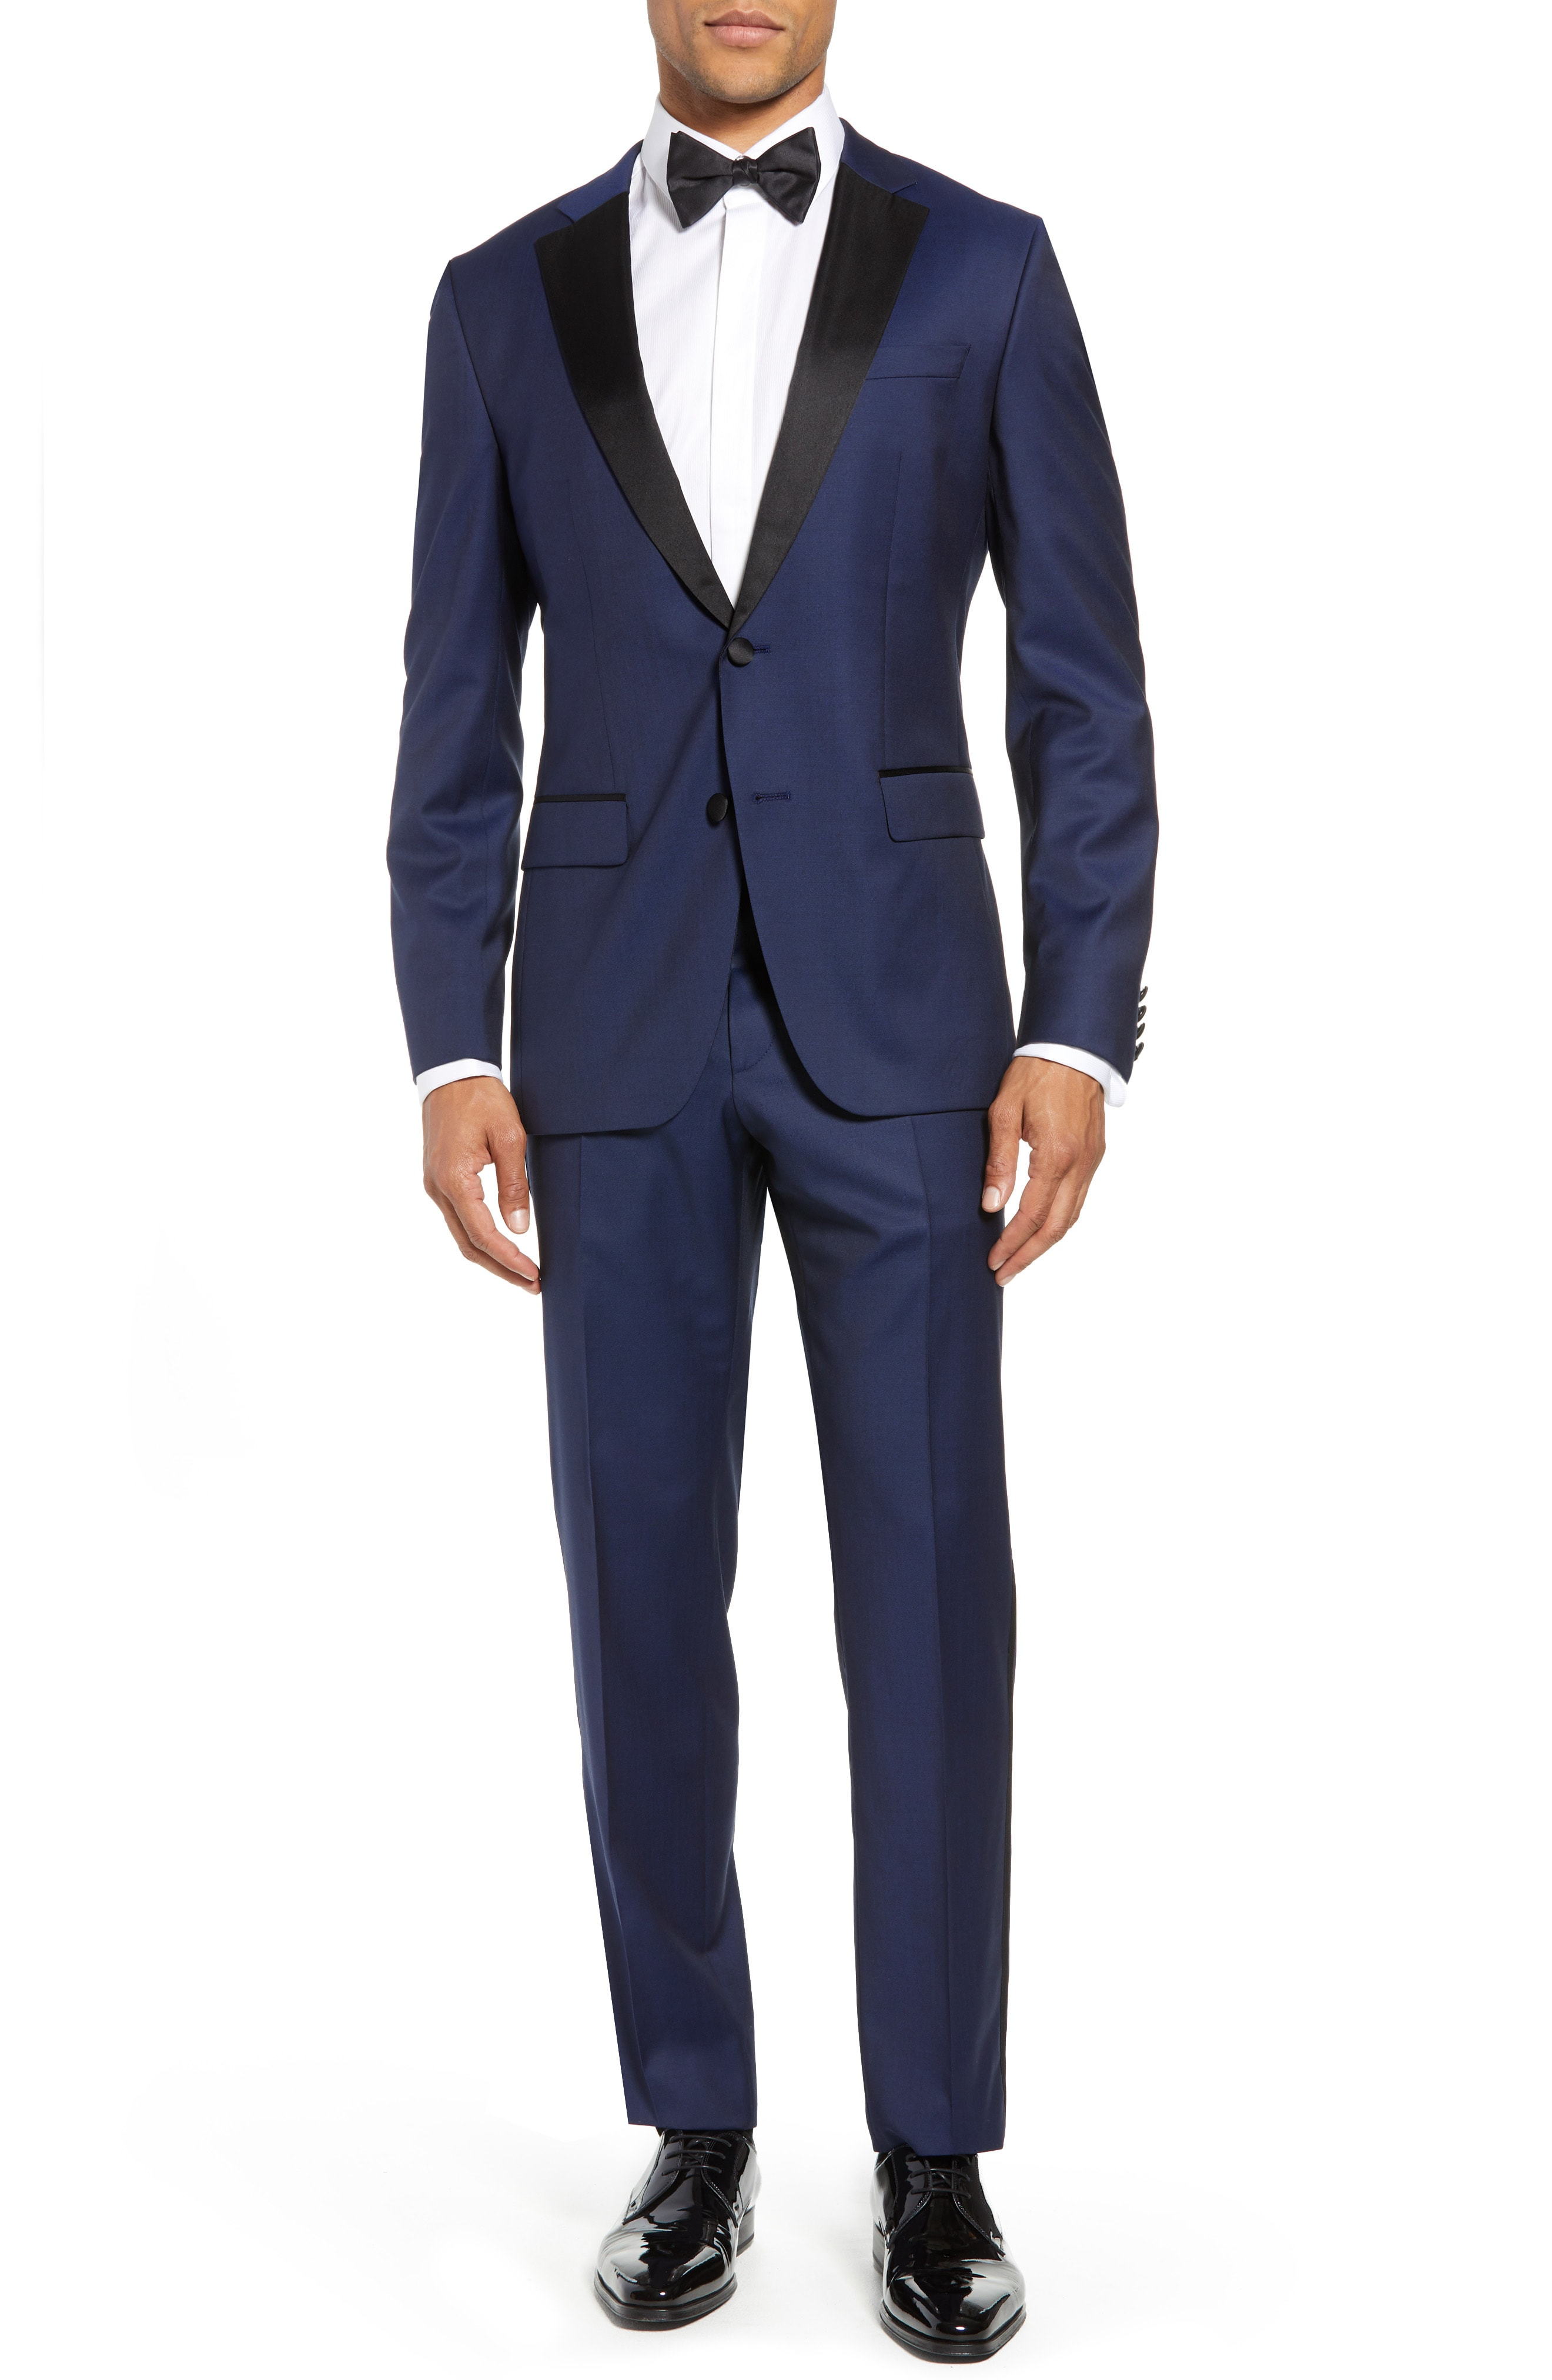 Men's Tuxedos: Wedding Suits & Formal Wear | Nordstrom